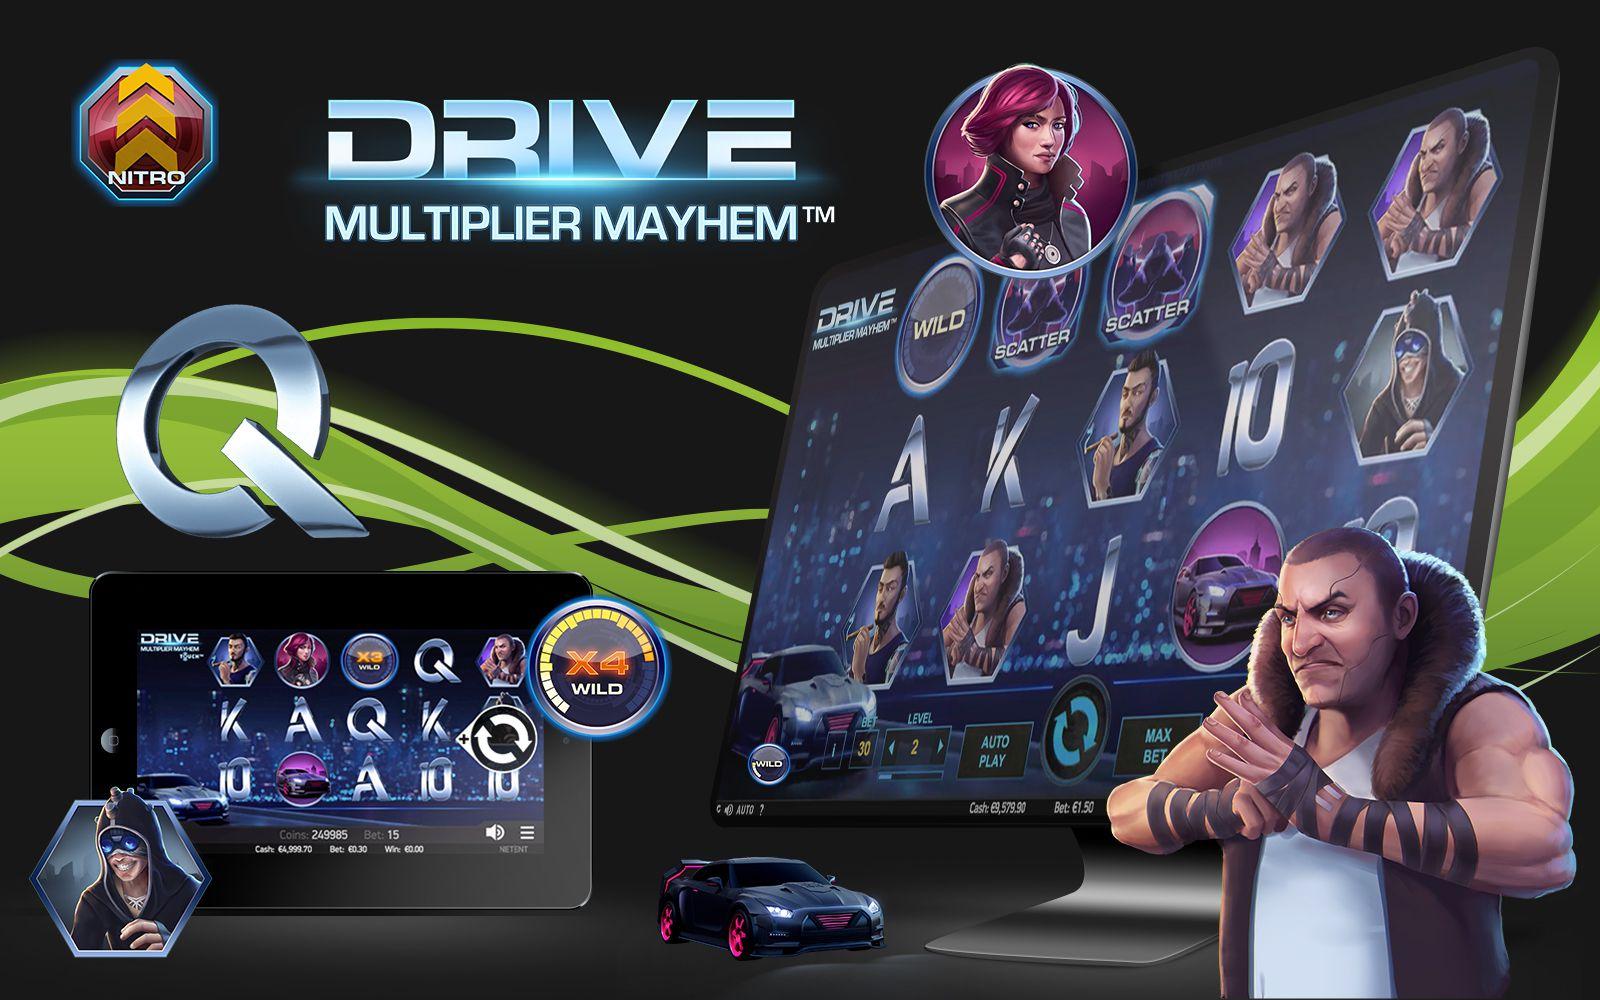 drive-multiplier-mayhem-netent